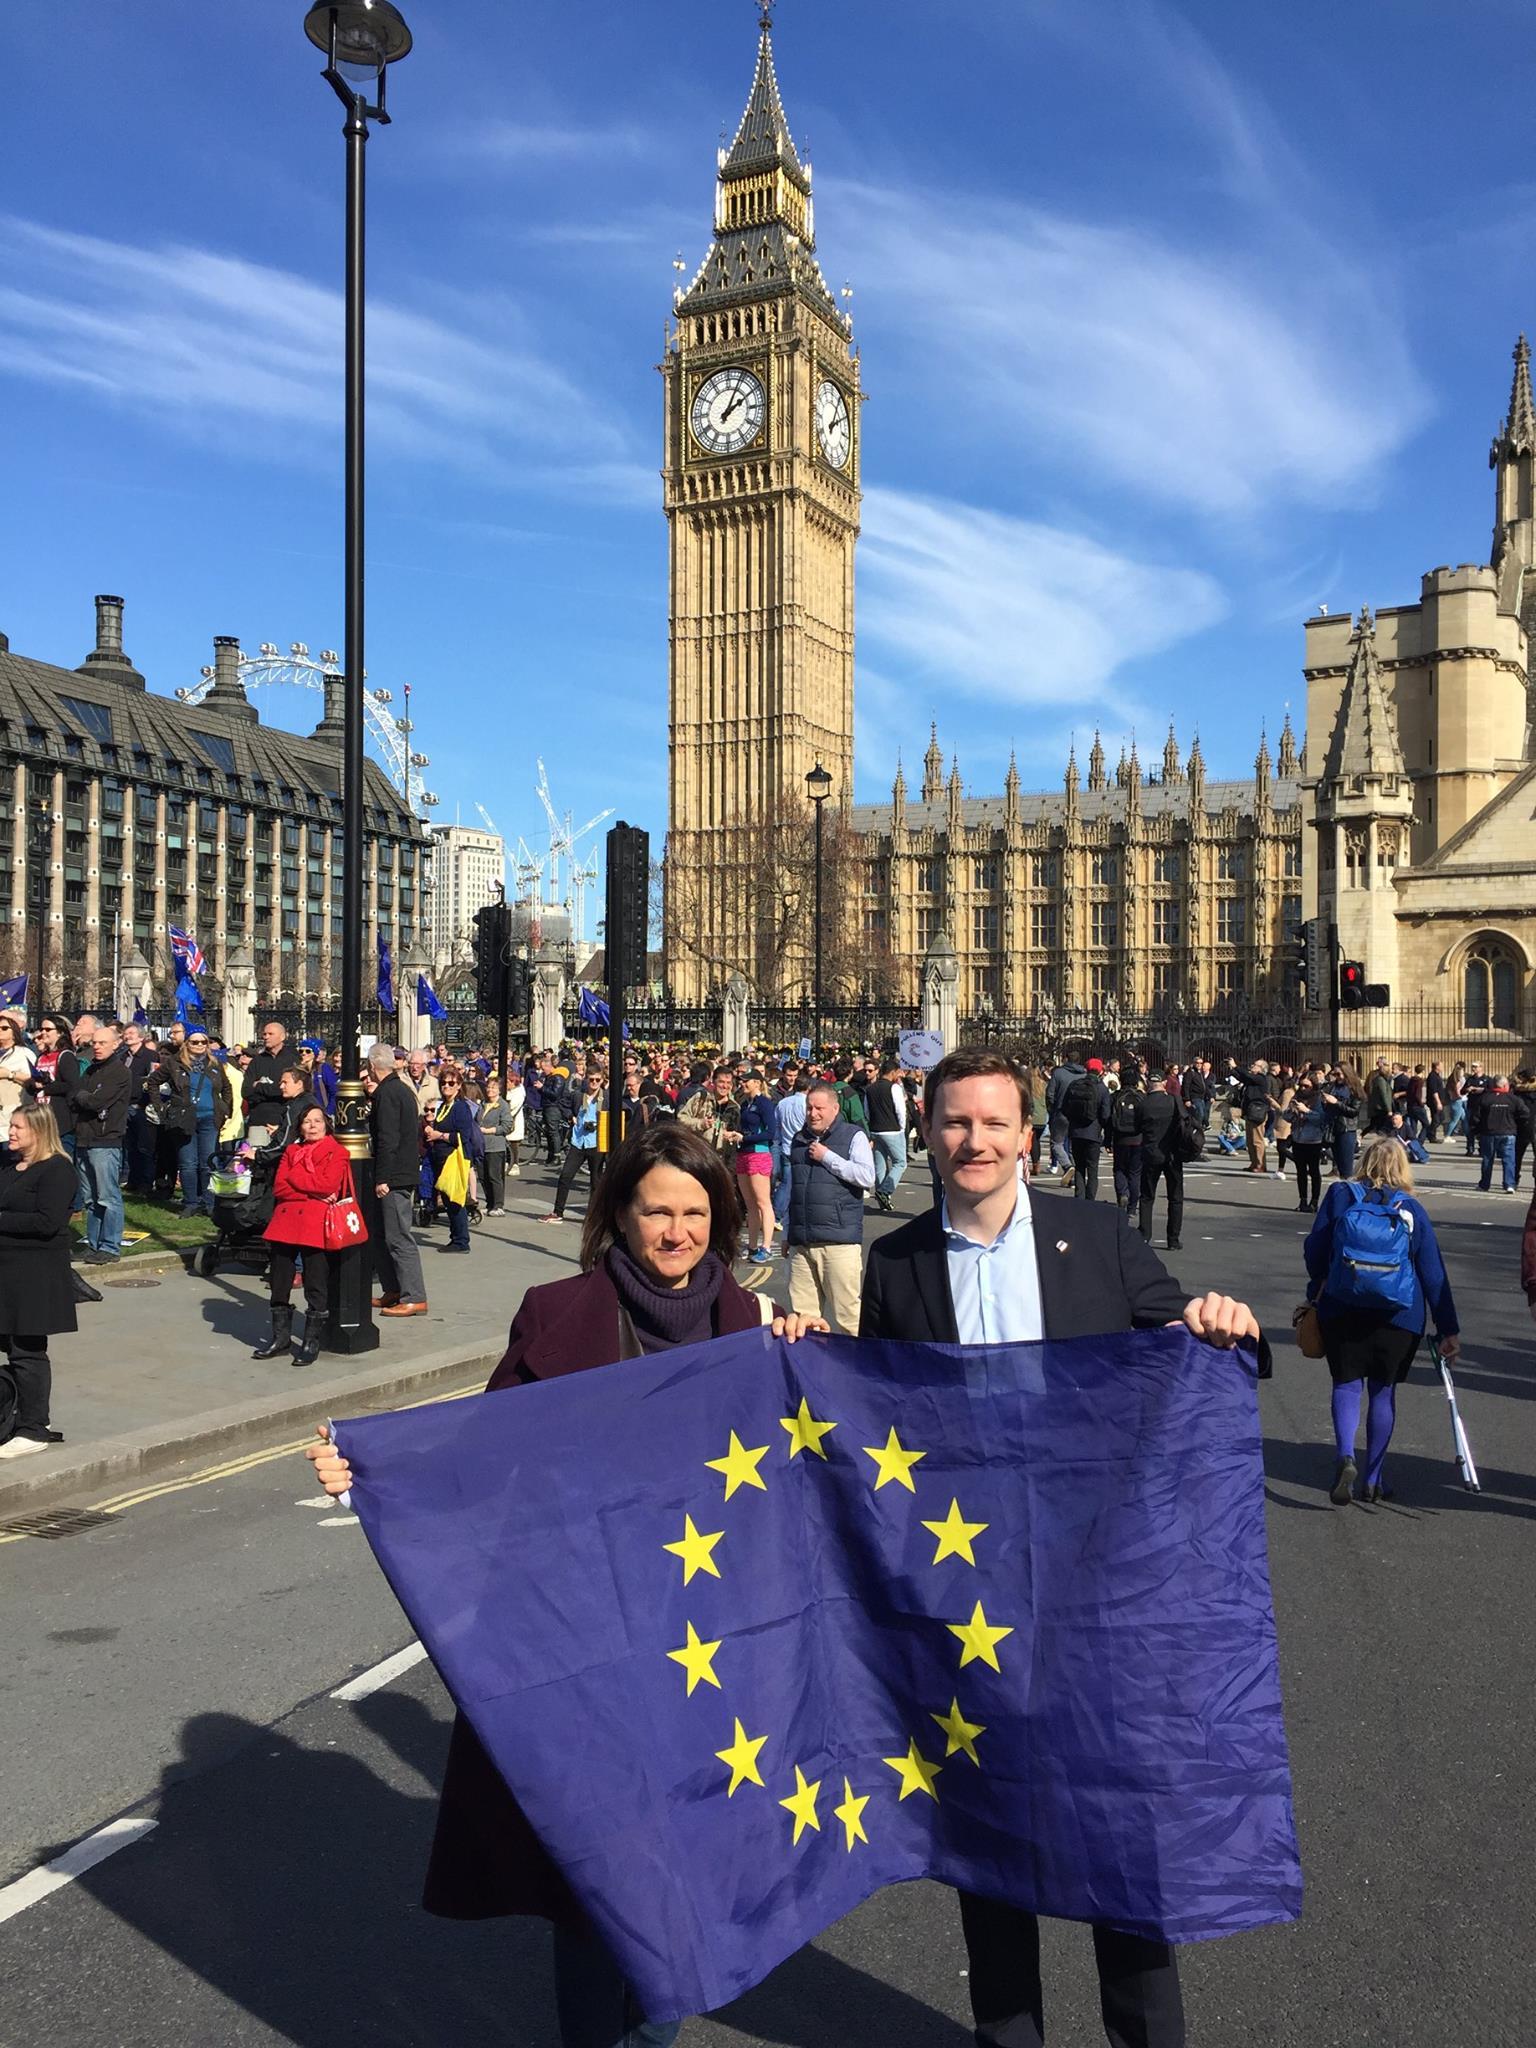 Catherine_and_Seb_Dance_at_EU_Rally.jpg